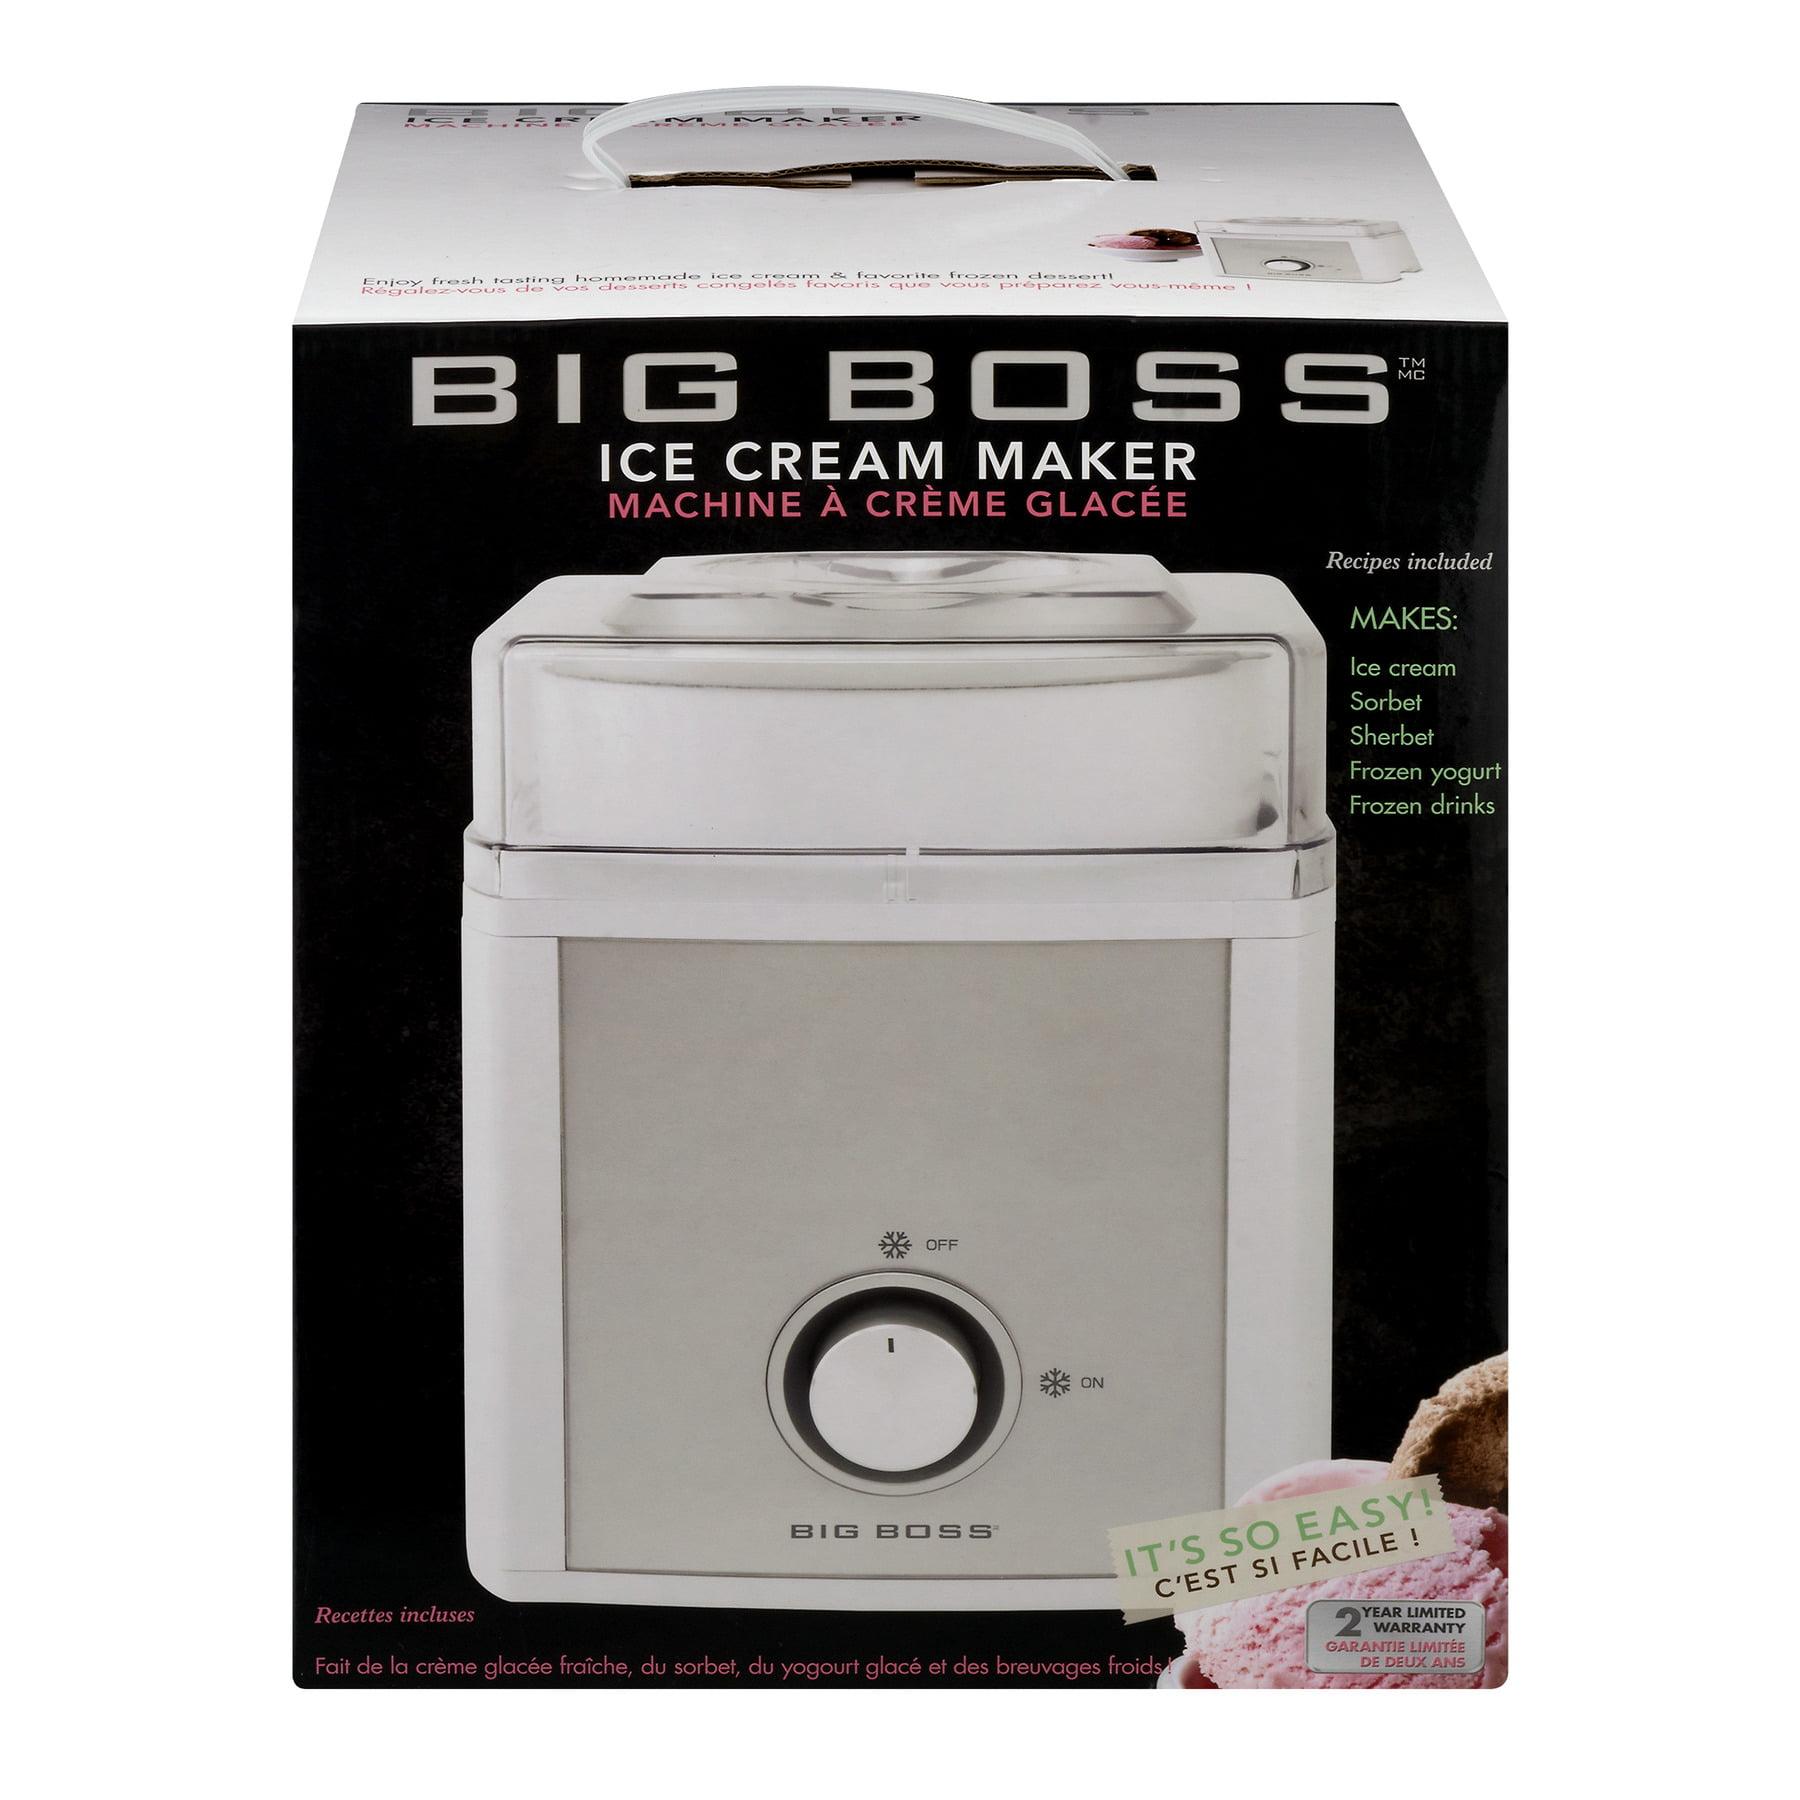 Big Boss Ice Cream Maker, 1.0 CT